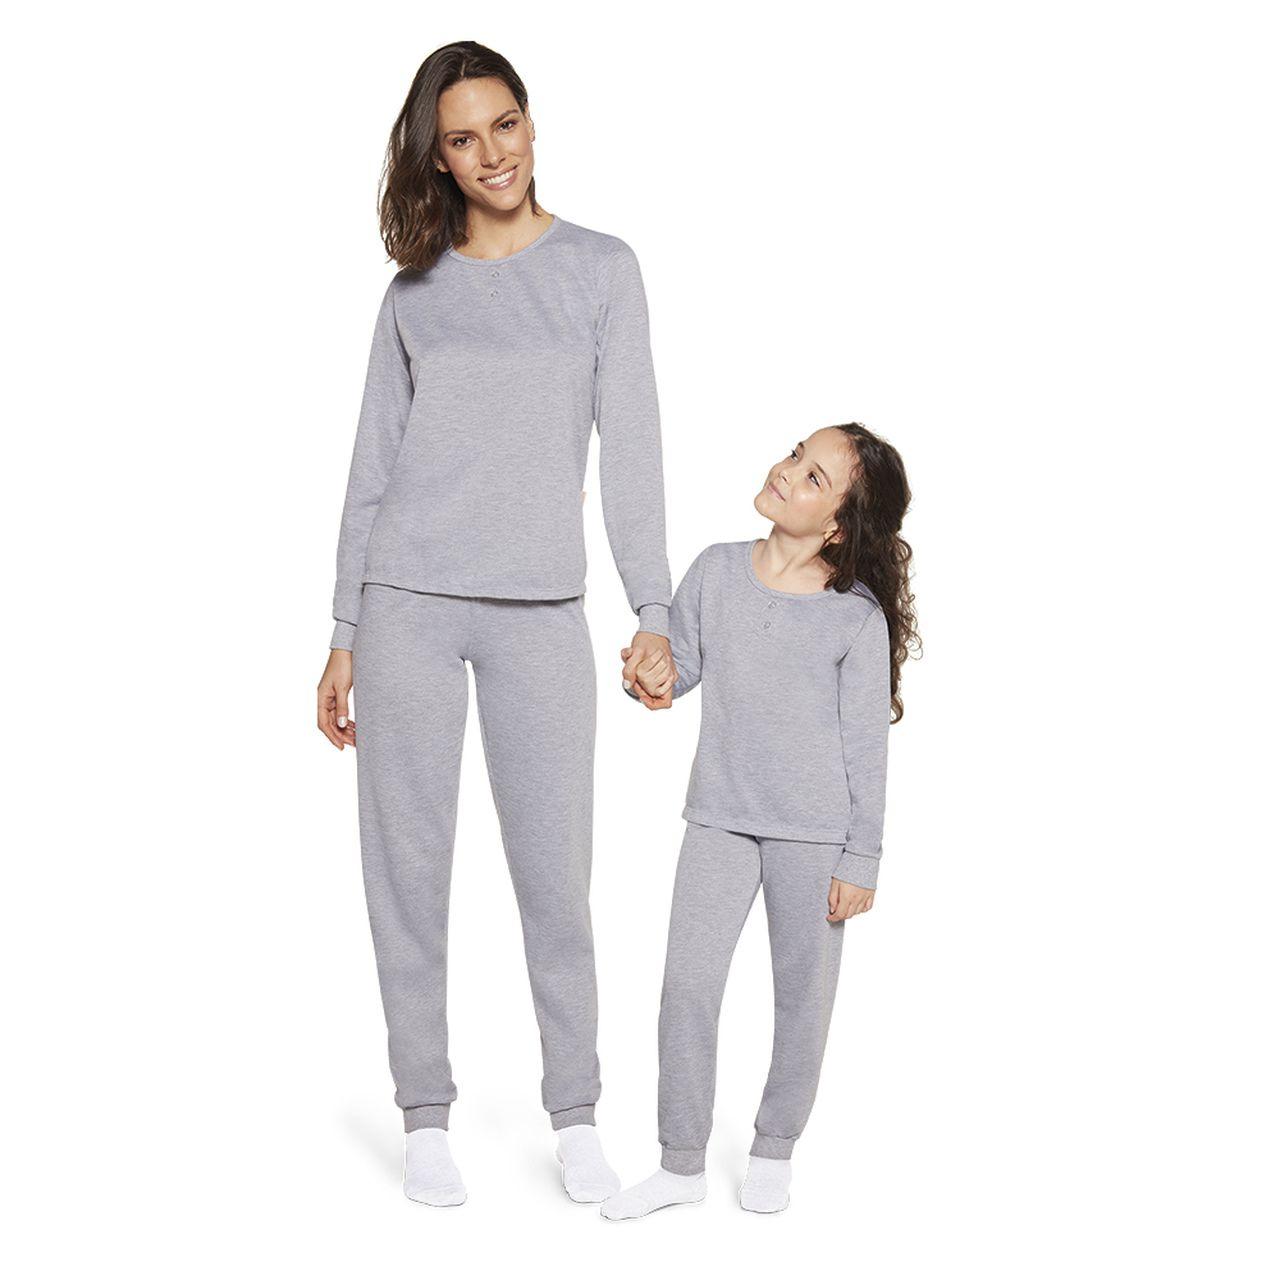 Pijama feminino inverno mescla calça punho mãe lupo